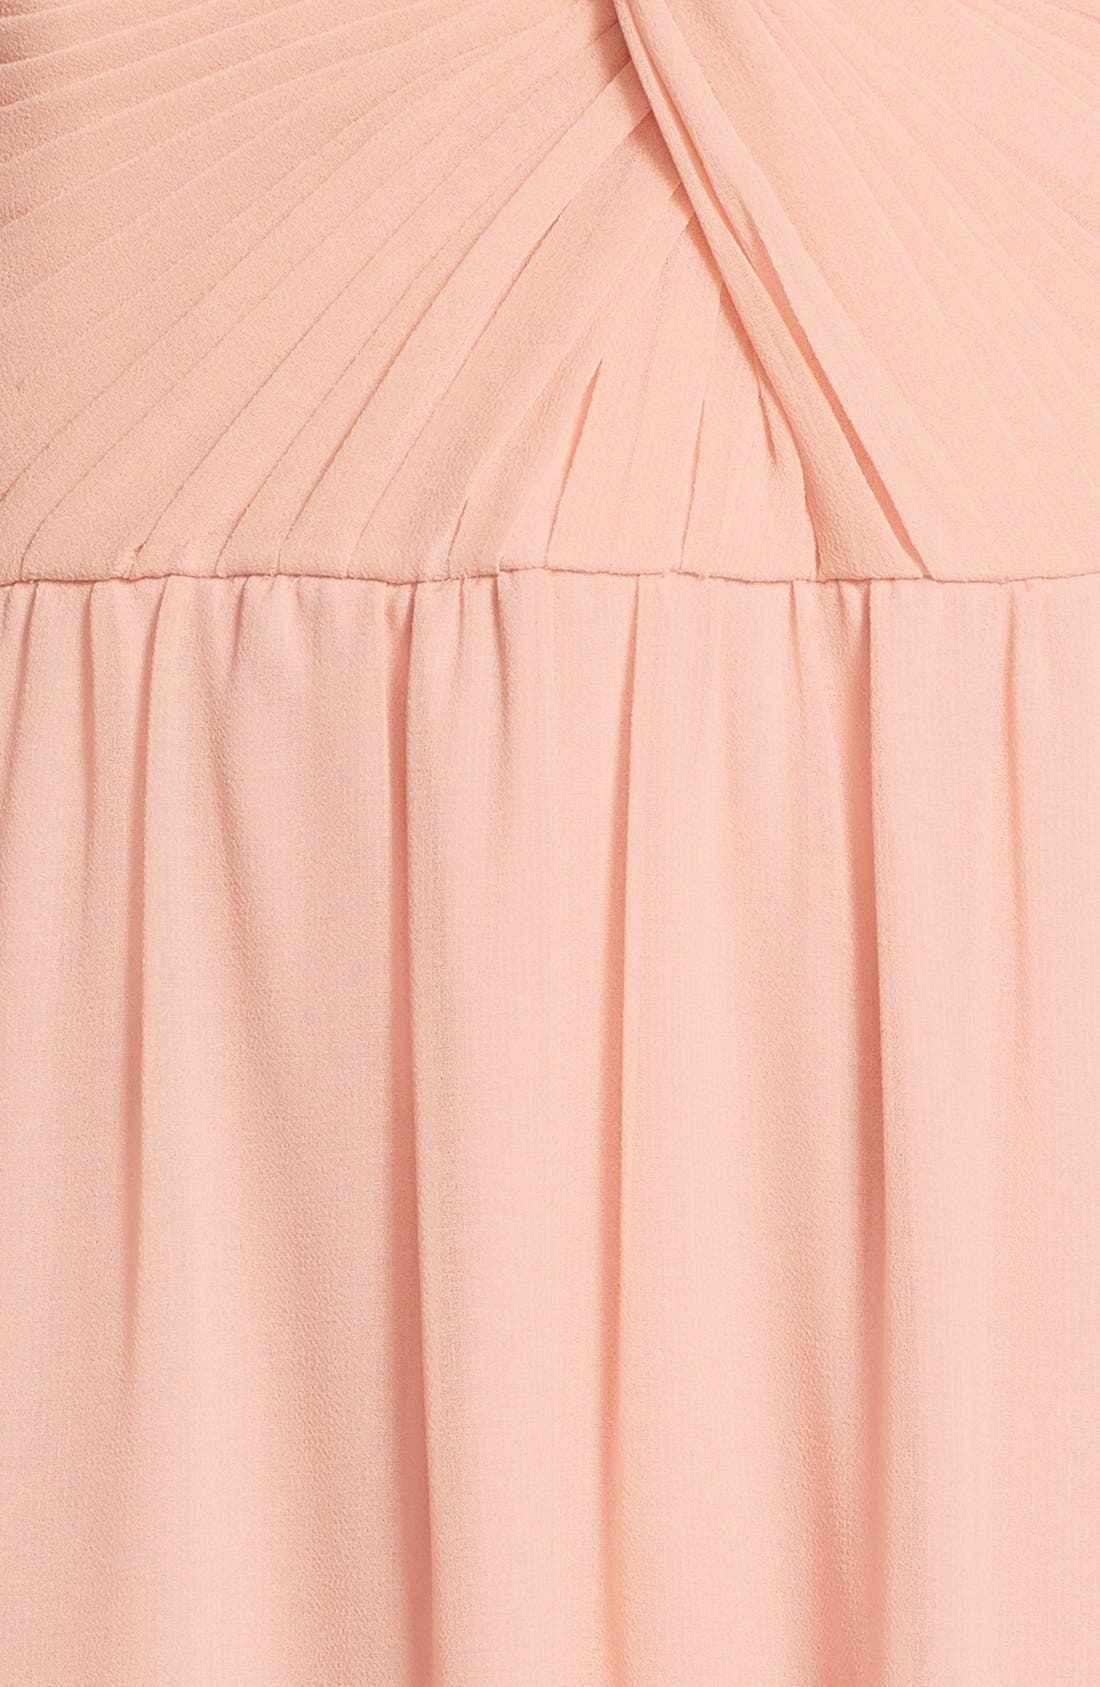 Alternate Image 3  - ERIN erin fetherston 'Clarisse' Off the Shoulder Front Twist Chiffon Gown